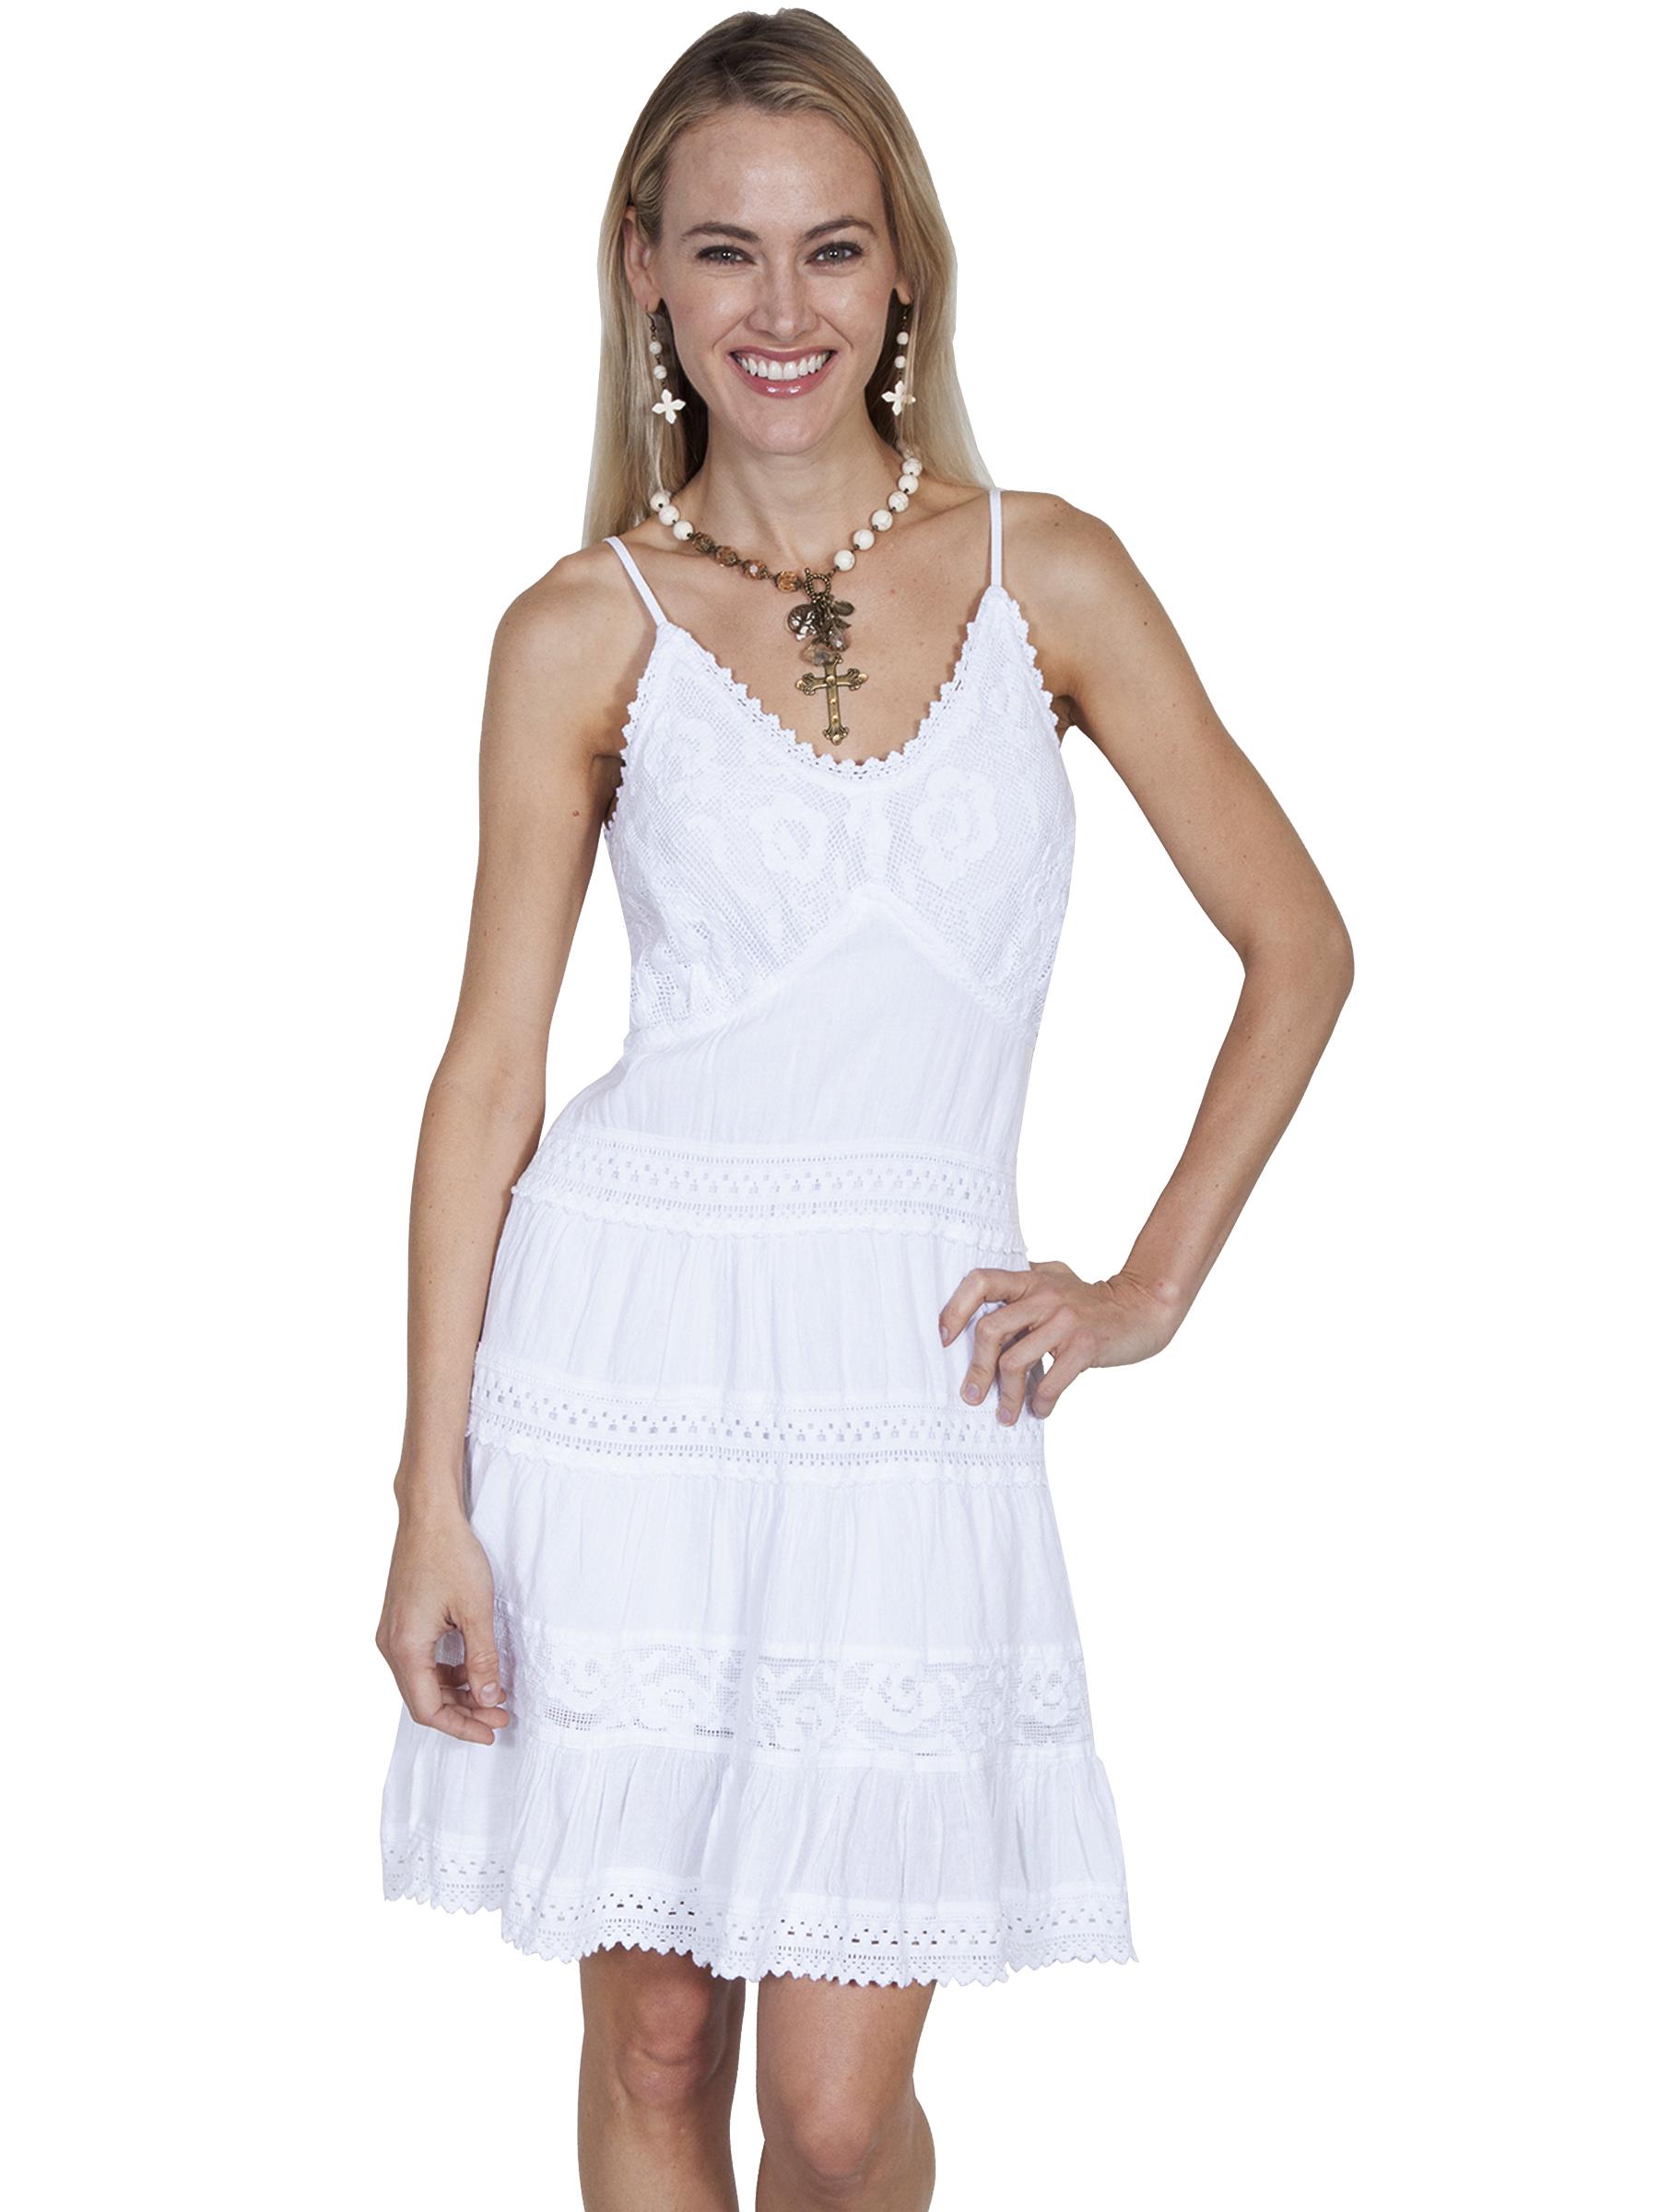 100% peruvian cotton short dress with spaghetti straps